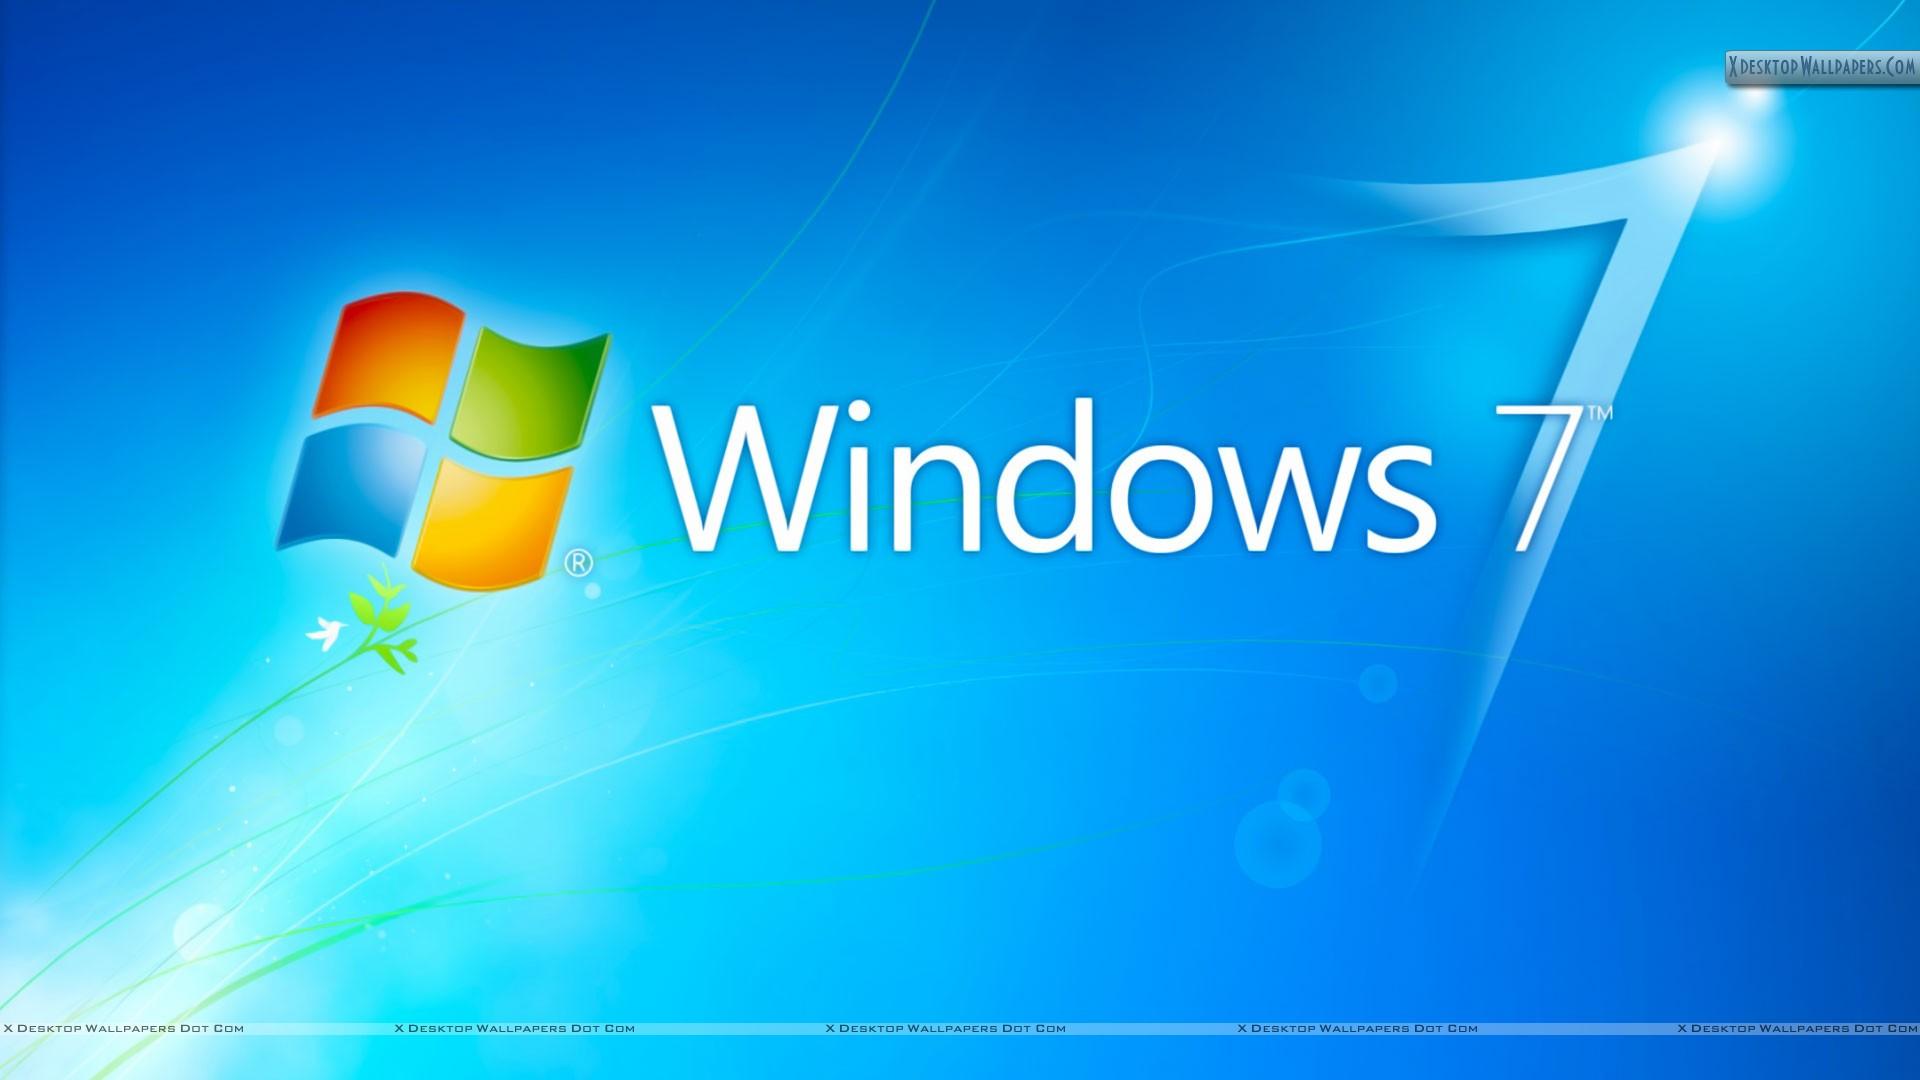 60 Microsoft Windows 7 Desktop Wallpaper On Wallpapersafari